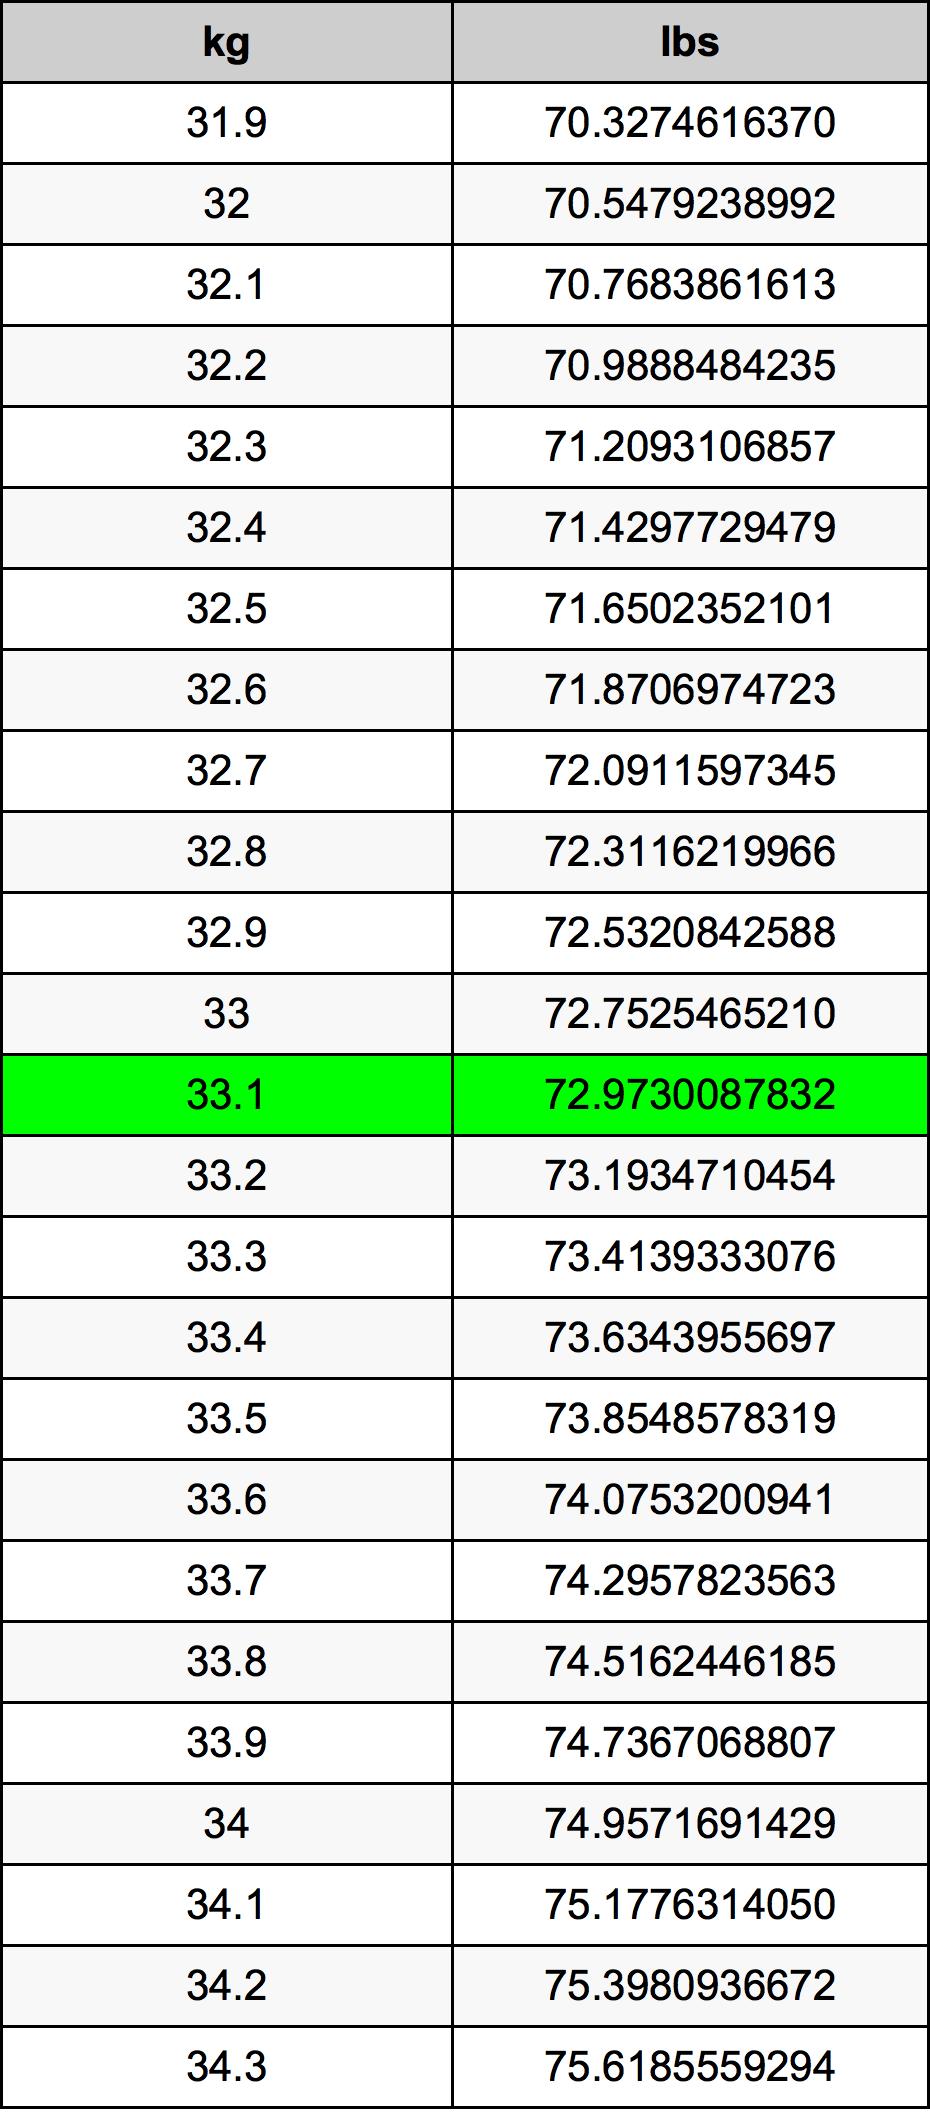 33.1 Kilogrami Table